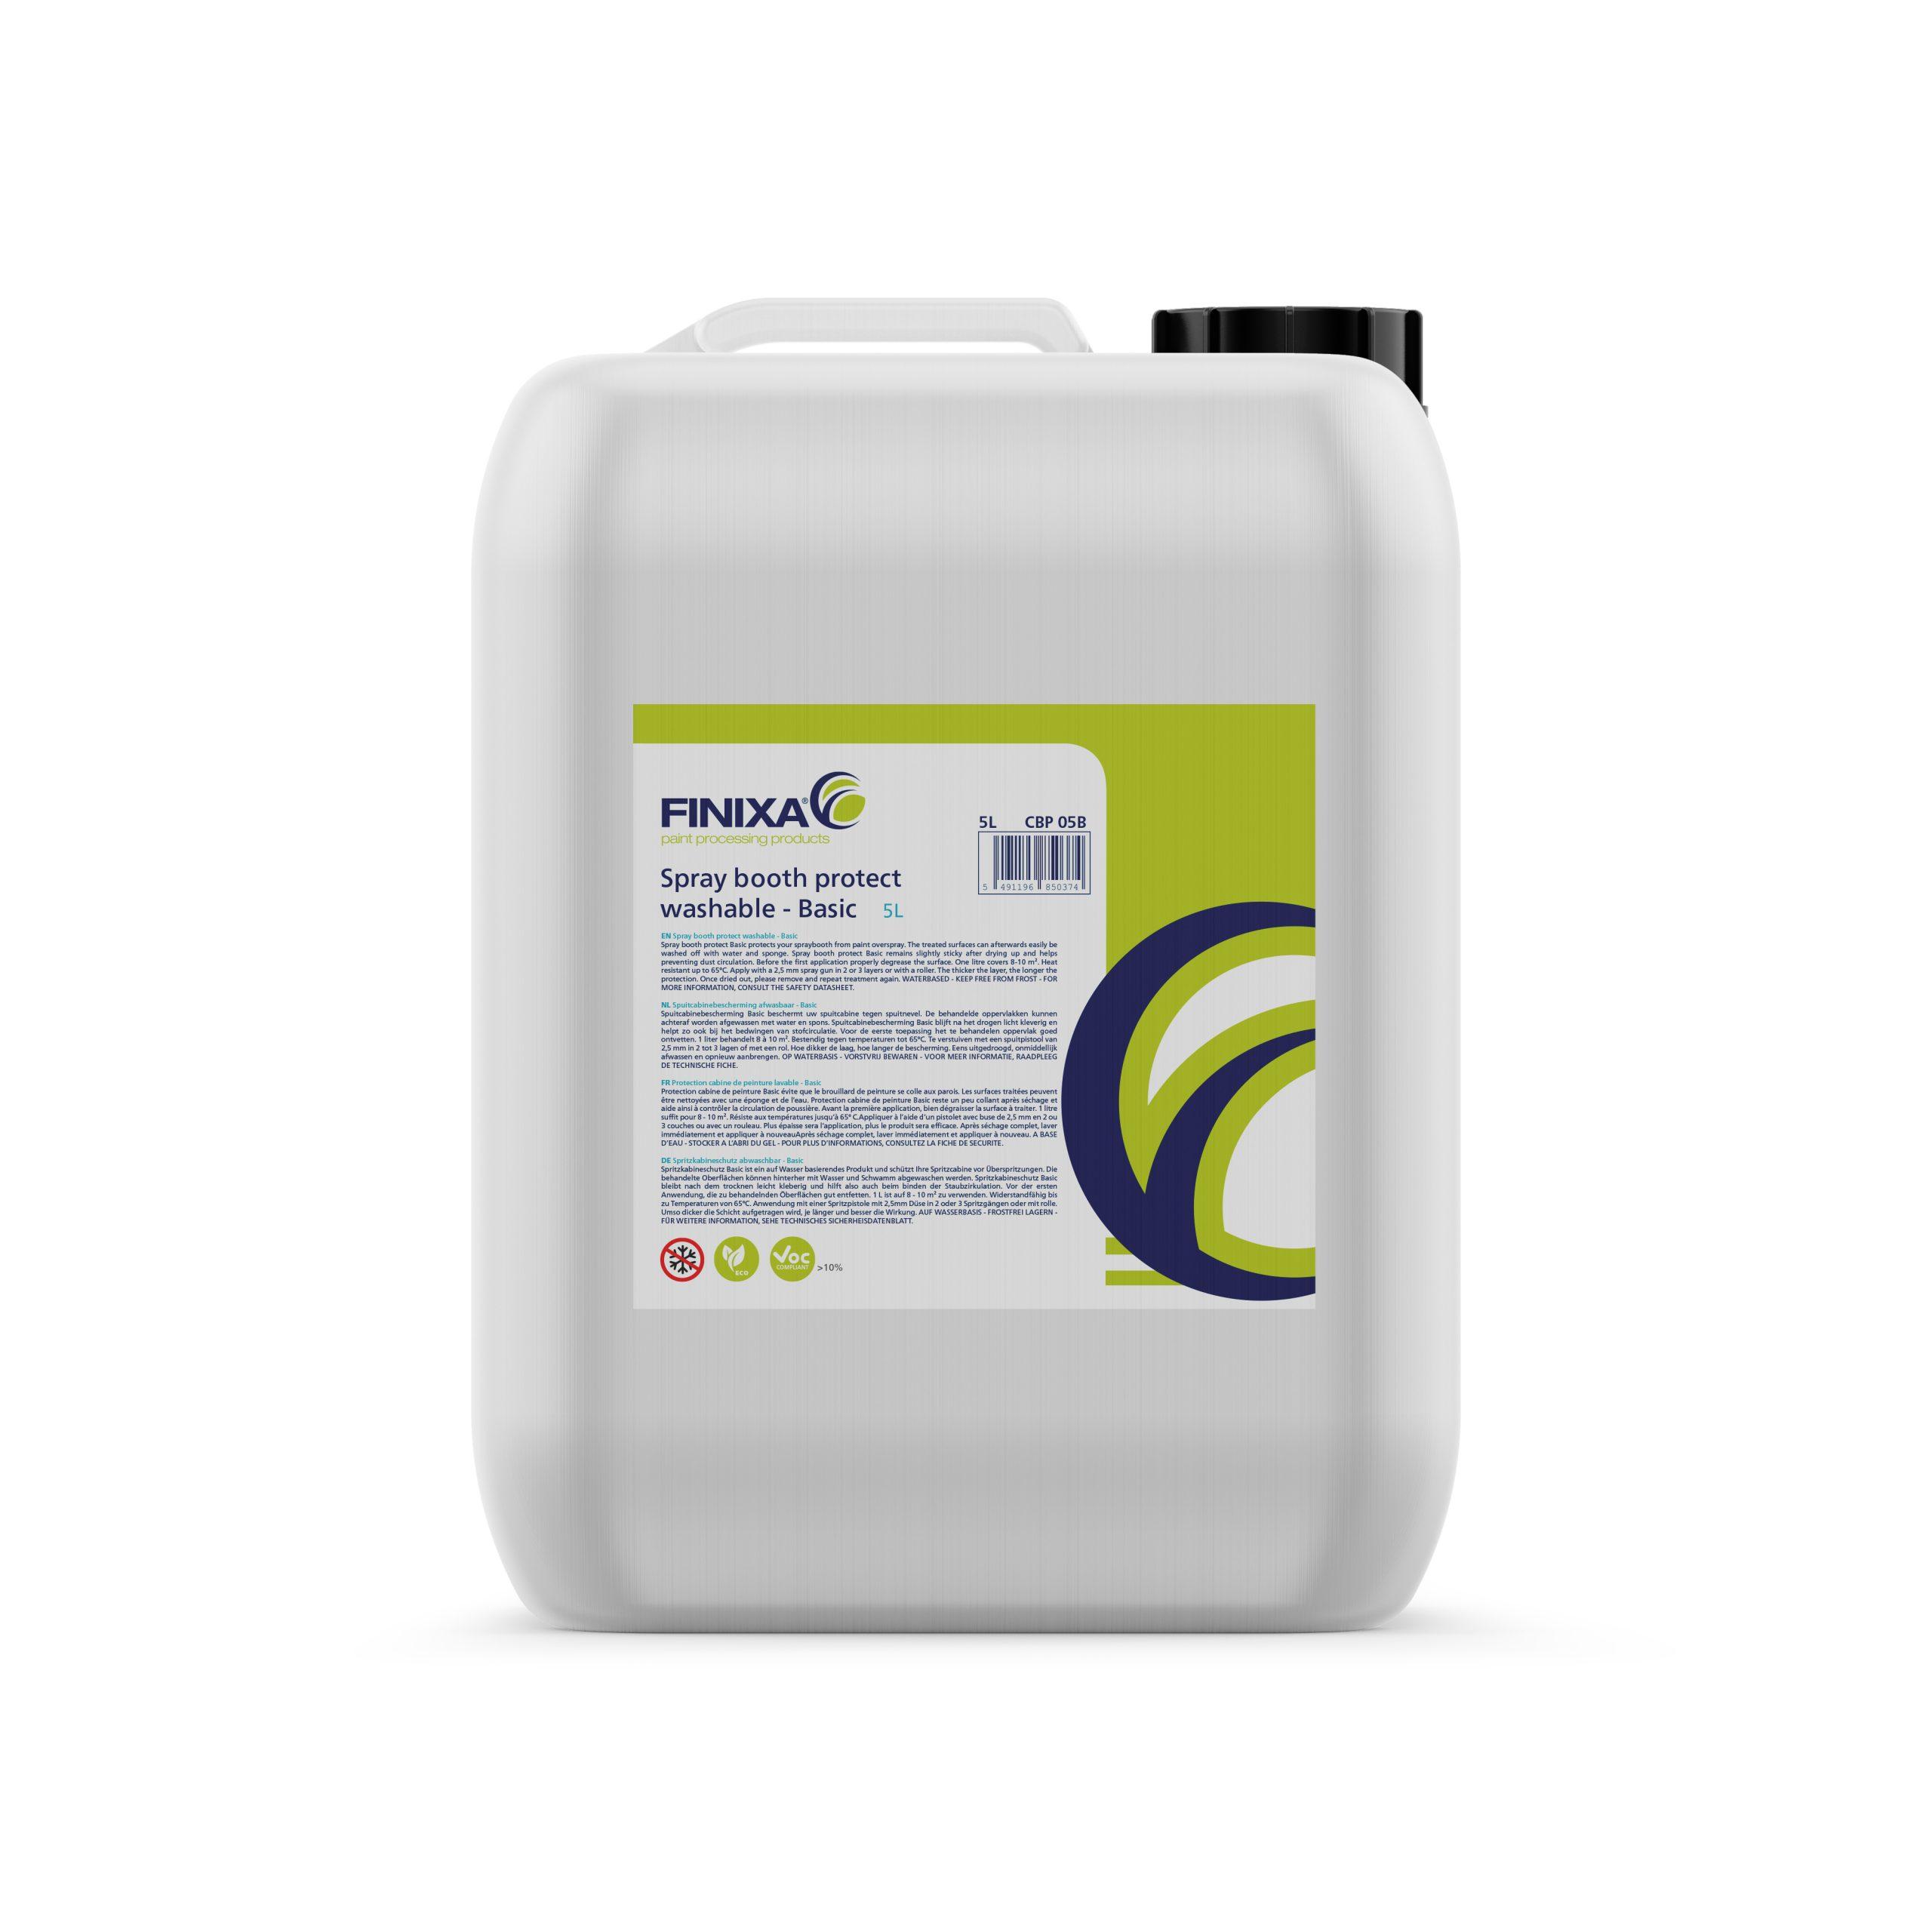 Spray booth protect Basic